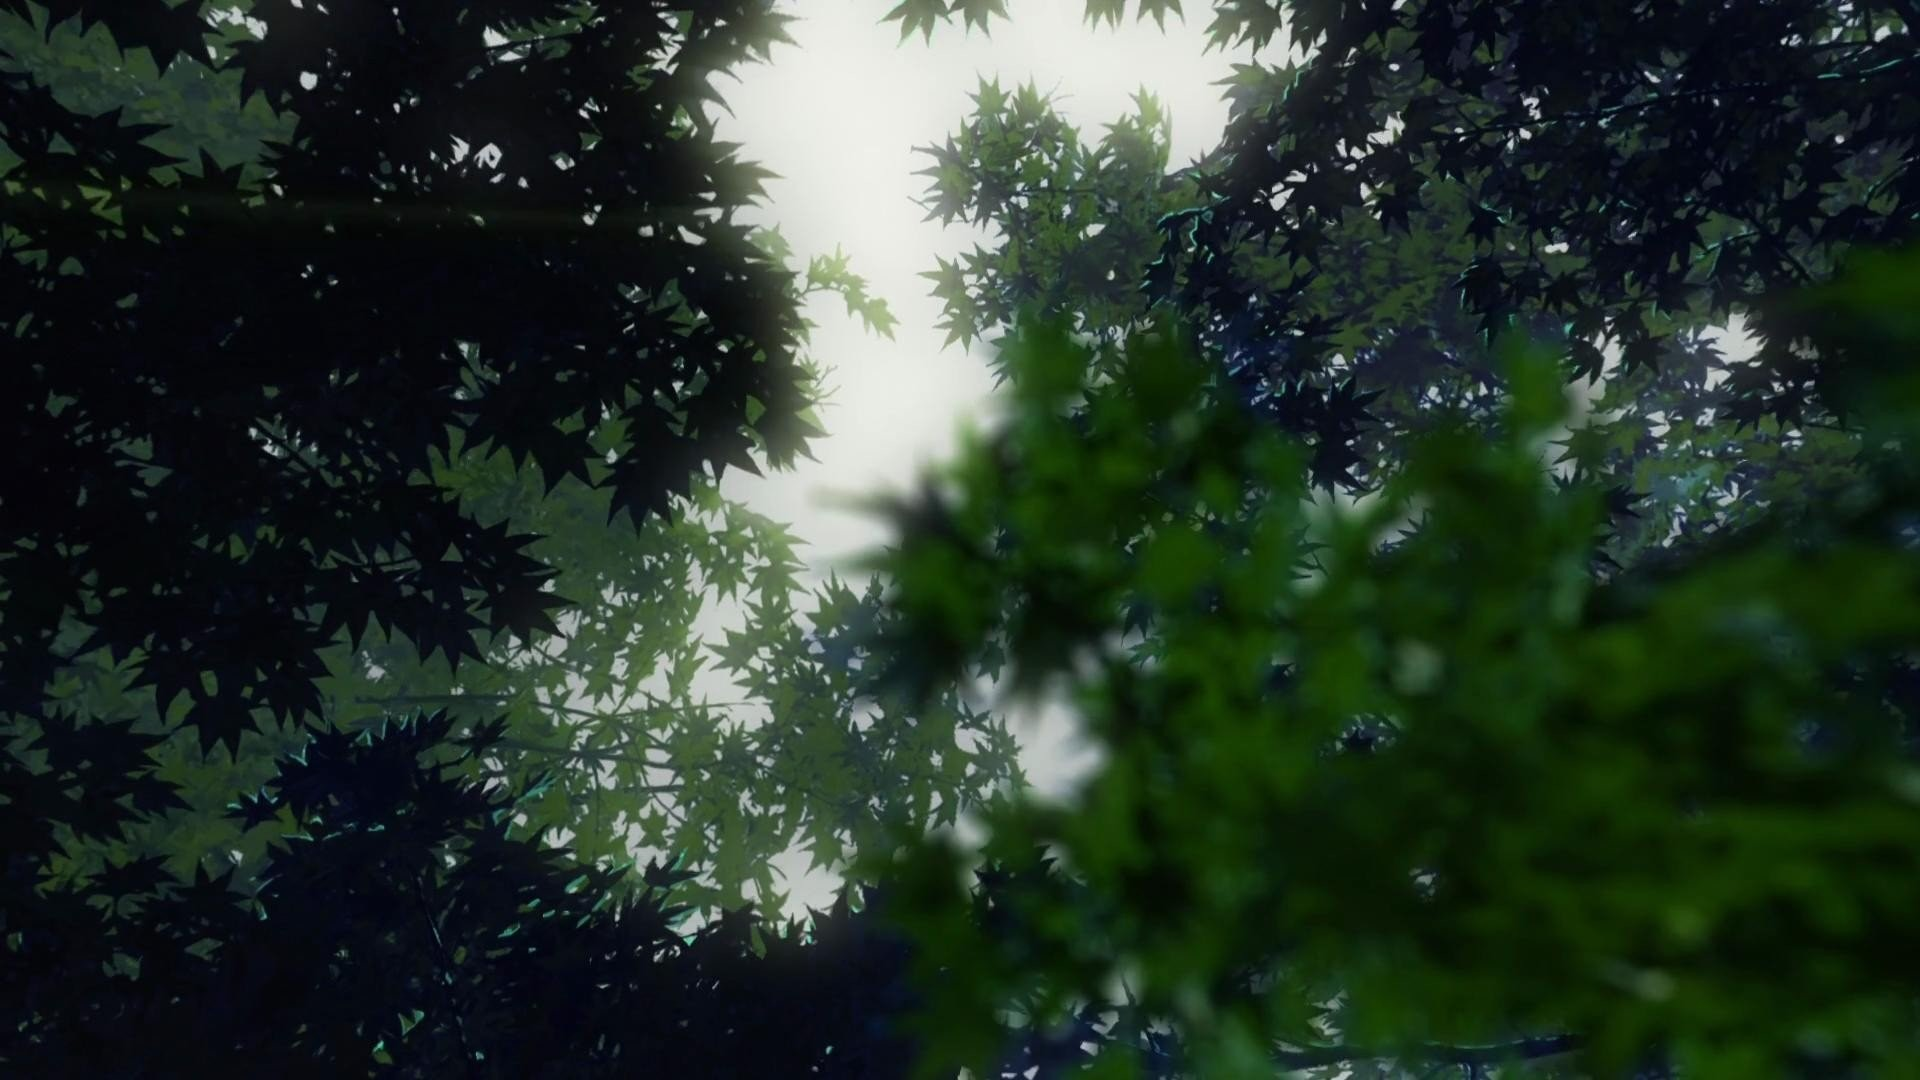 Makoto Shinkai anime The Garden of Words wallpaper | | 338252 |  WallpaperUP